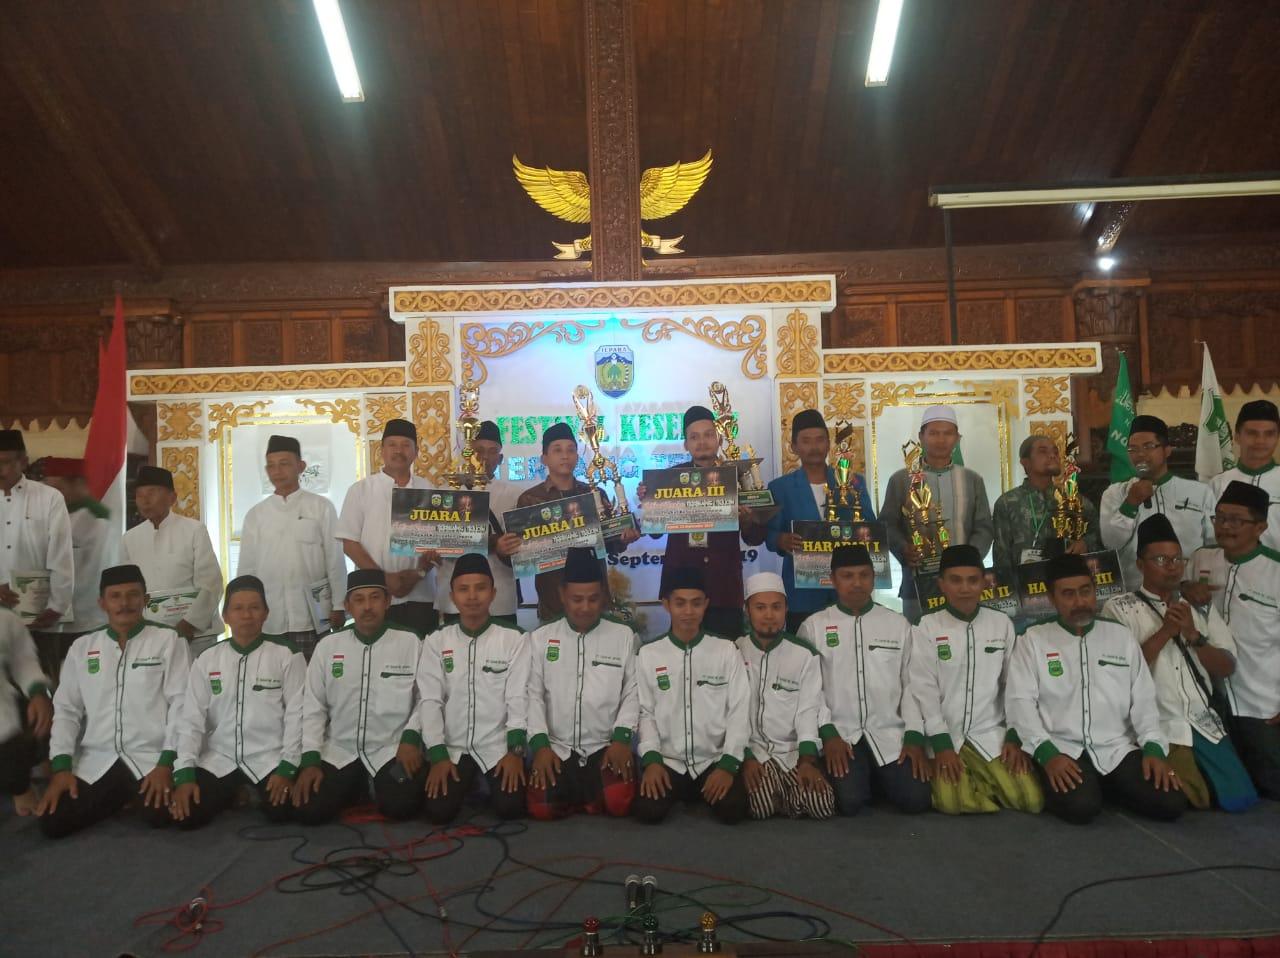 Festival Kesenian Terbang Telon Se Kabupaten Jepara tahun 2019